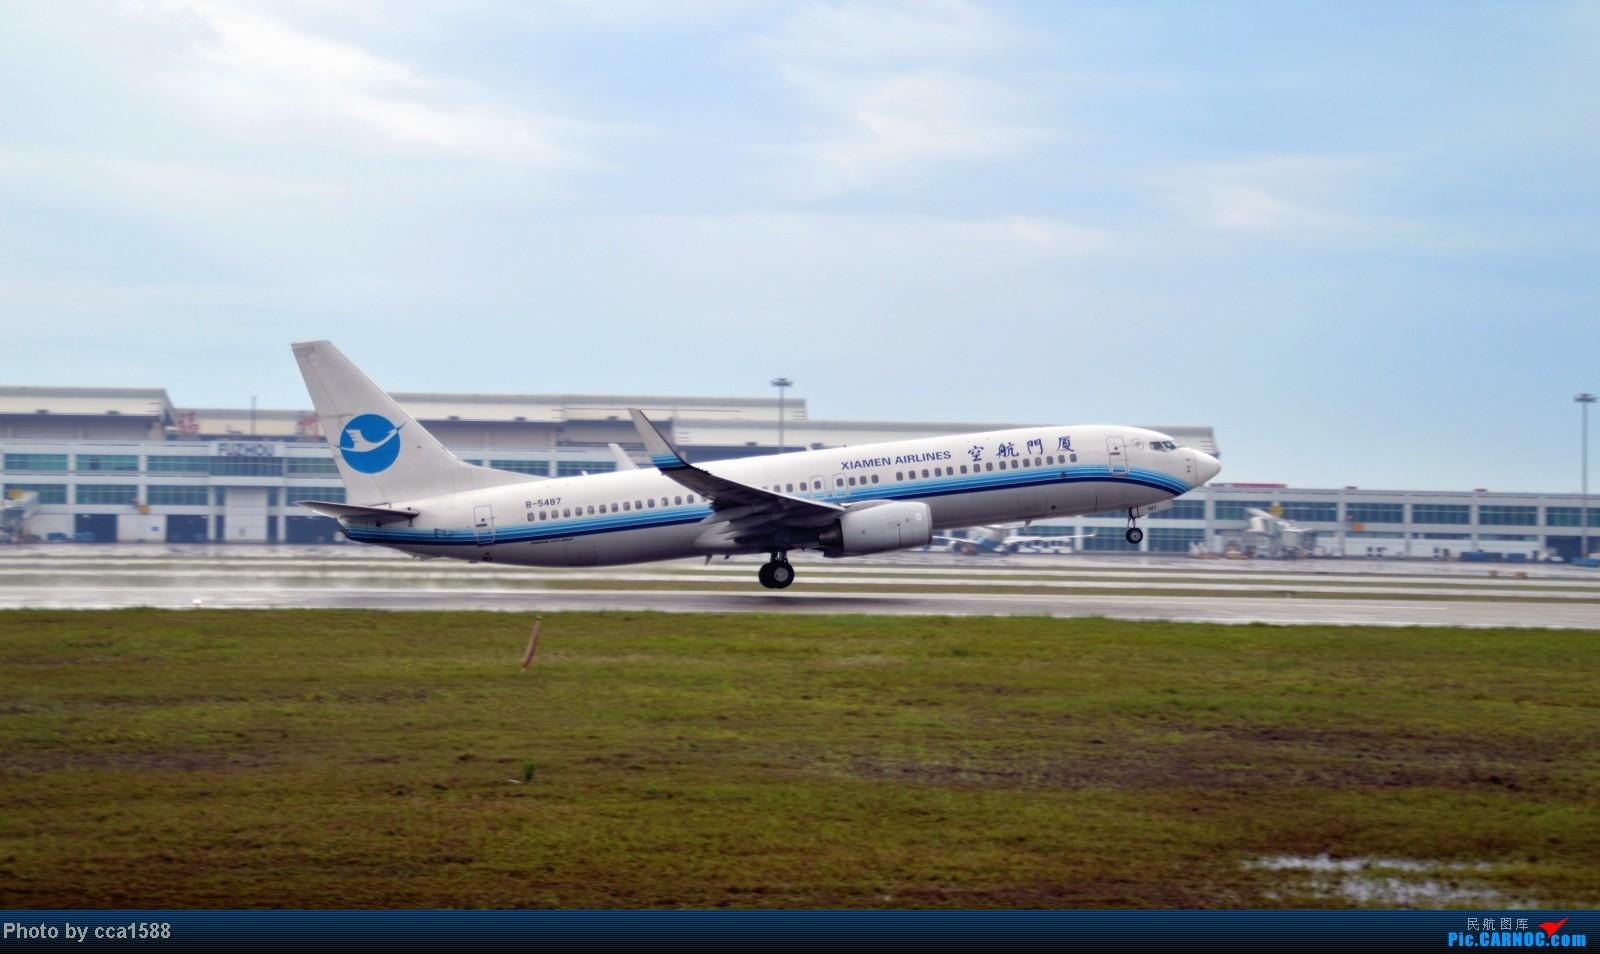 Re:[原创]4.26FOC拍机--烂天出好机,各种奇葩货~~ BOEING 737-800 B-5487 中国福州长乐机场